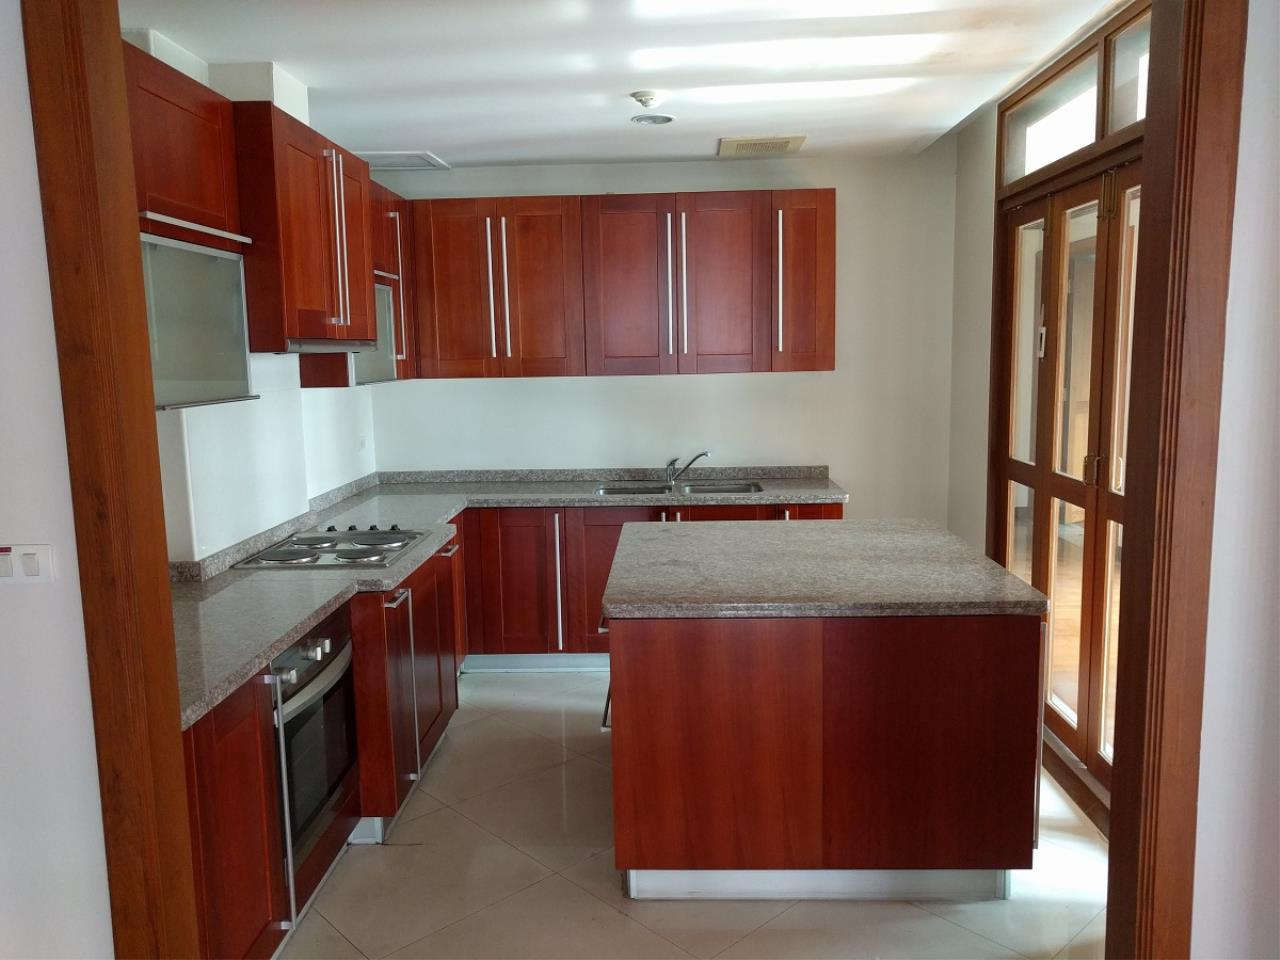 RE/MAX CondoDee Agency's Thai Elegance Luxury Condominium - Entire Building for Sale 22